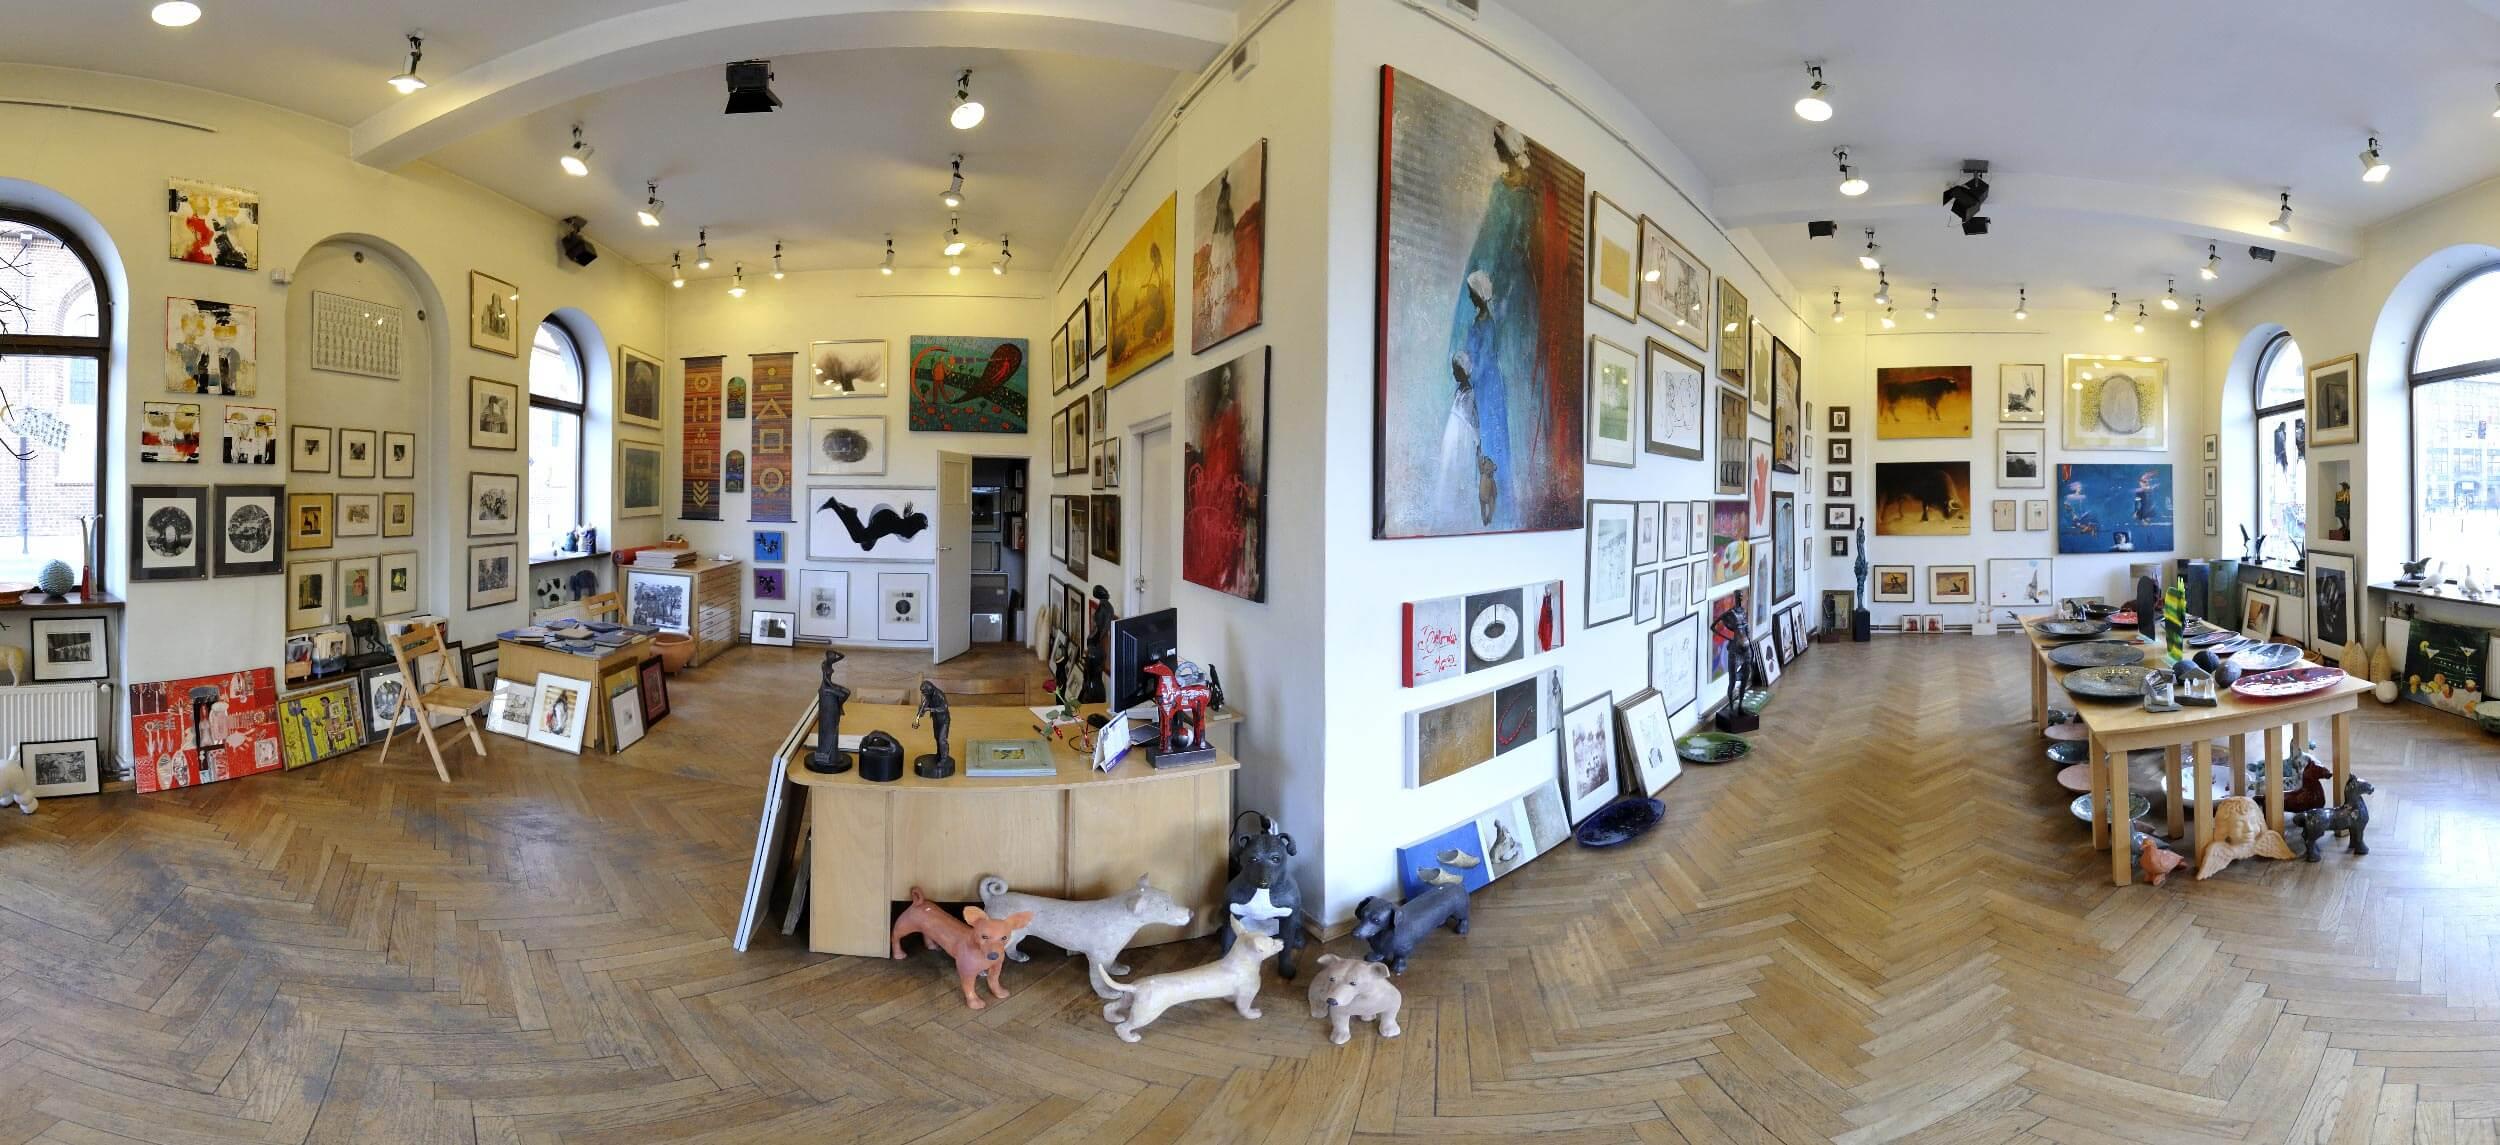 "360°-Panorama für Artgalerie ""Galeria M"" in Wrocław (Polen)"